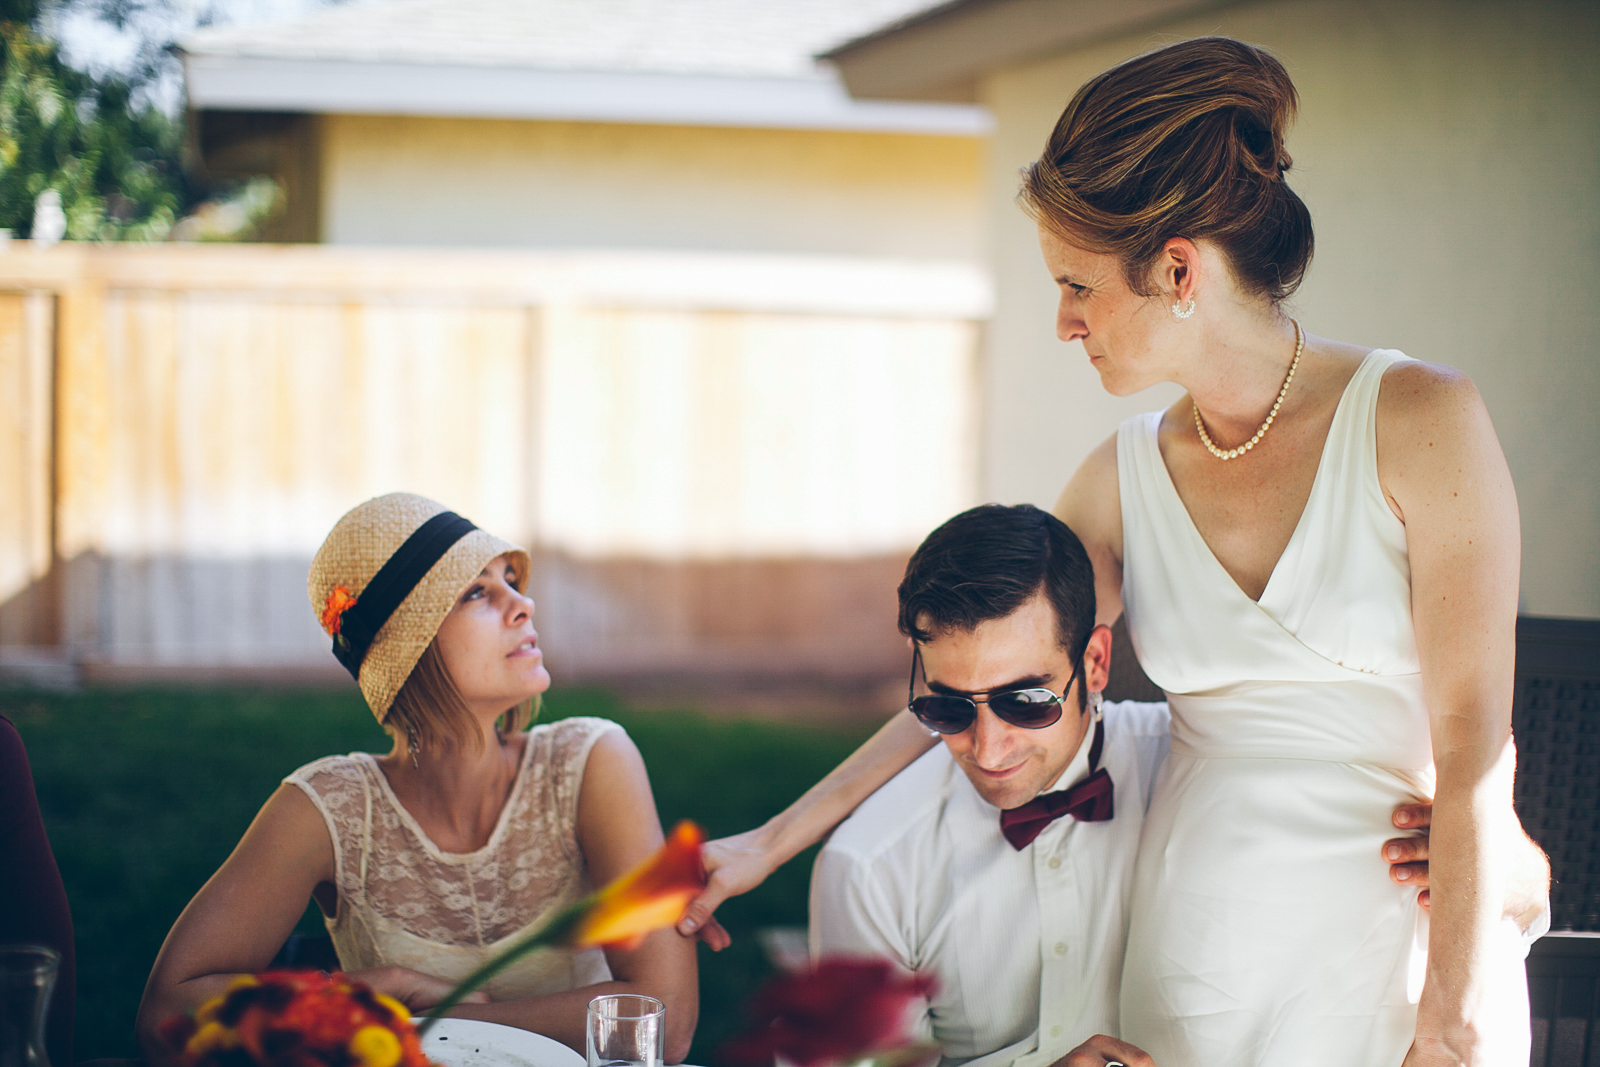 Riverside_ca_wedding_photography_marguerite_carolyn_ebony_siovhan_bokeh_photography_55.jpg